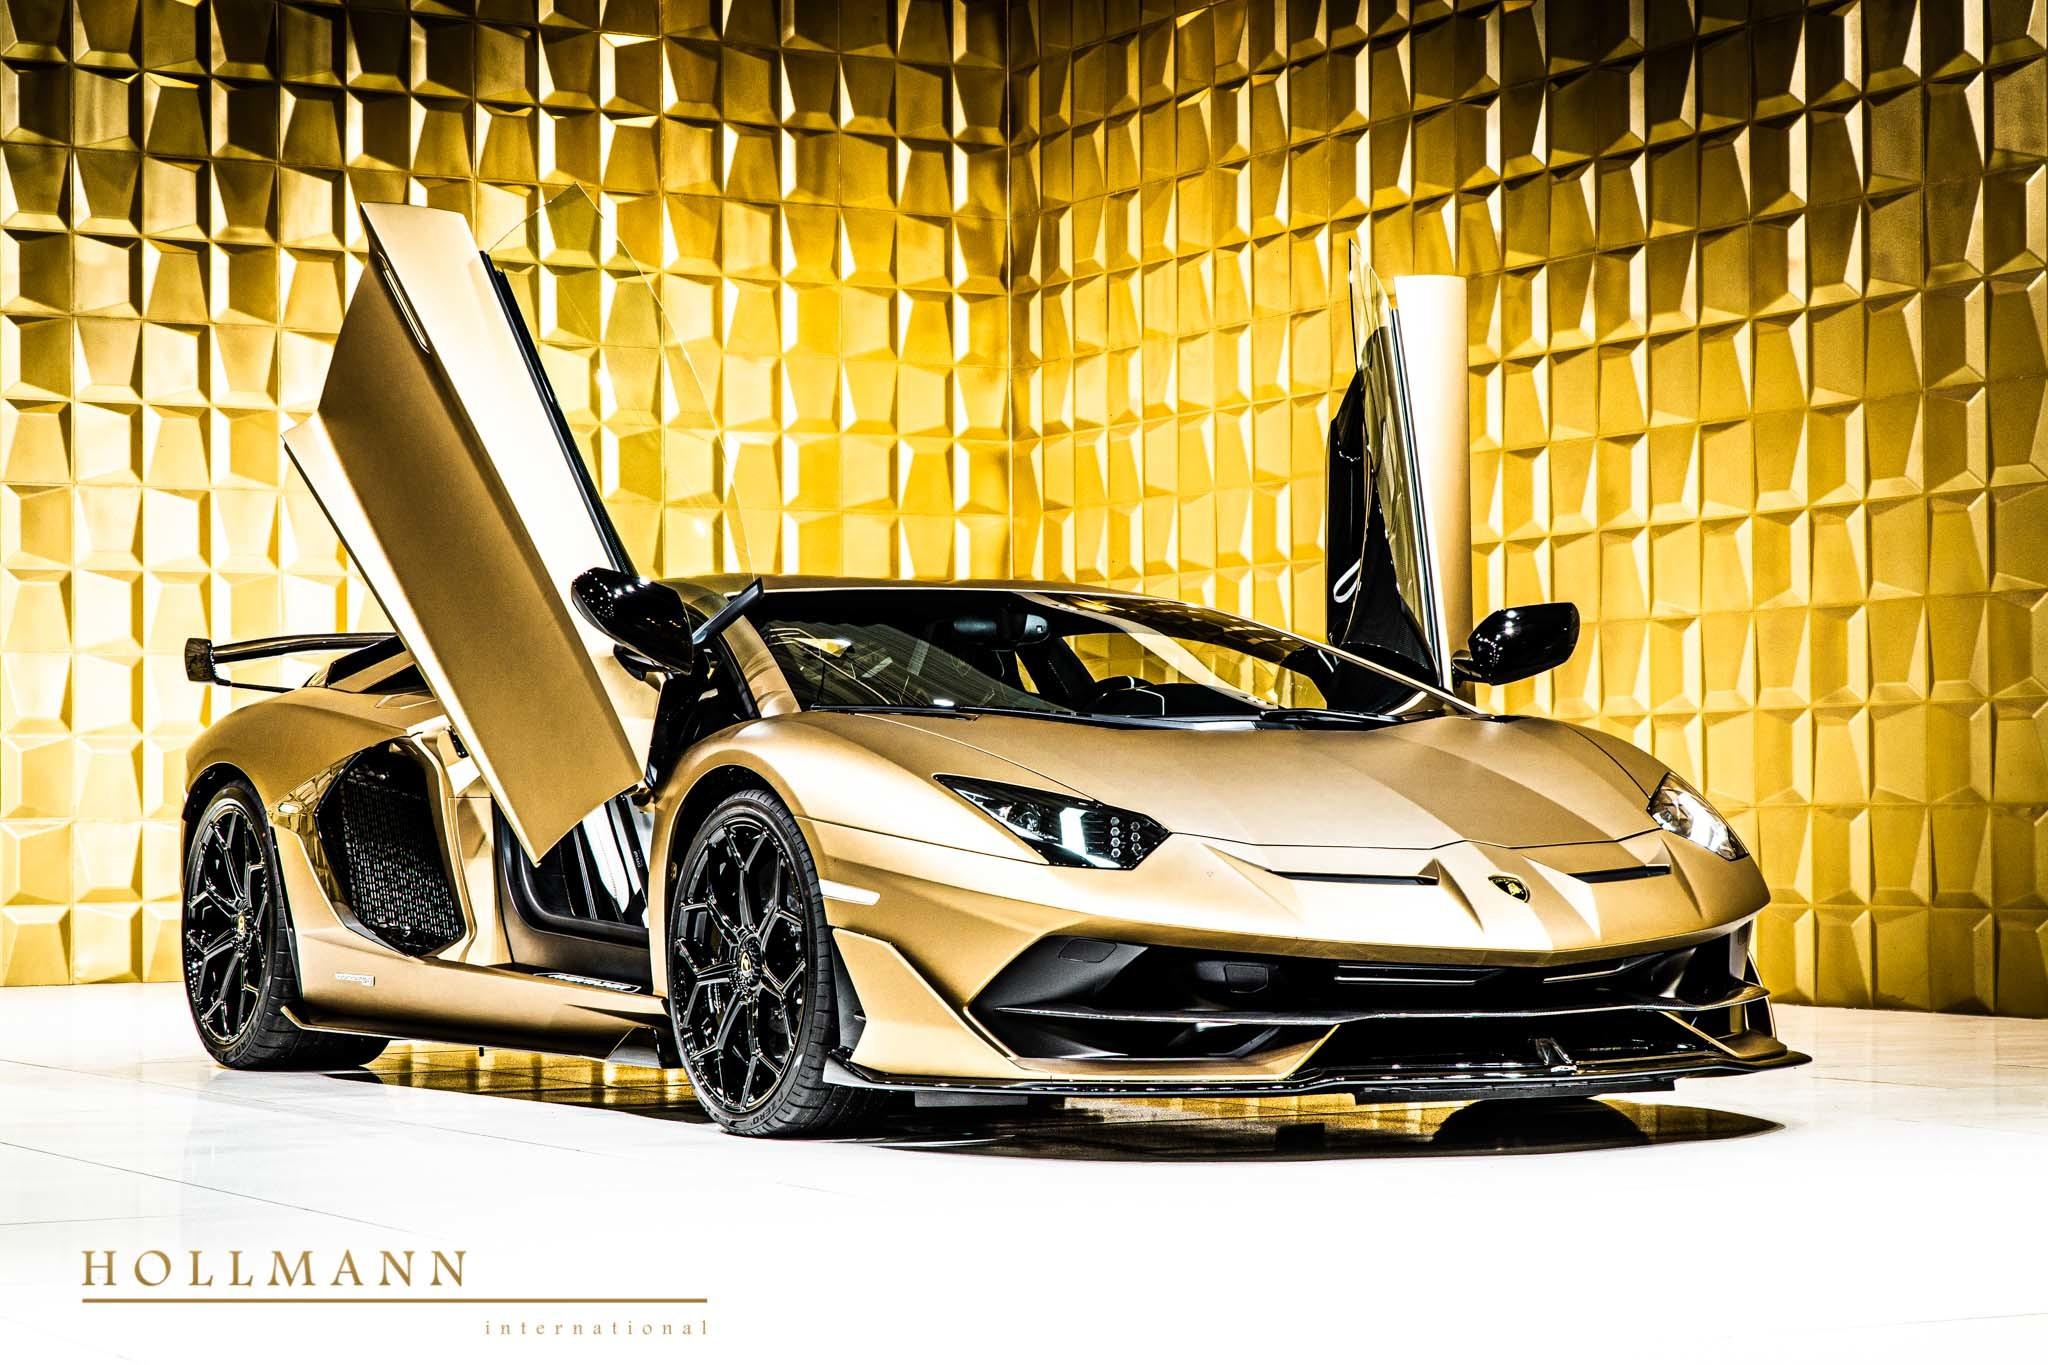 Lamborghini Aventador Svj Hollmann International Germany For Sale On Luxurypulse